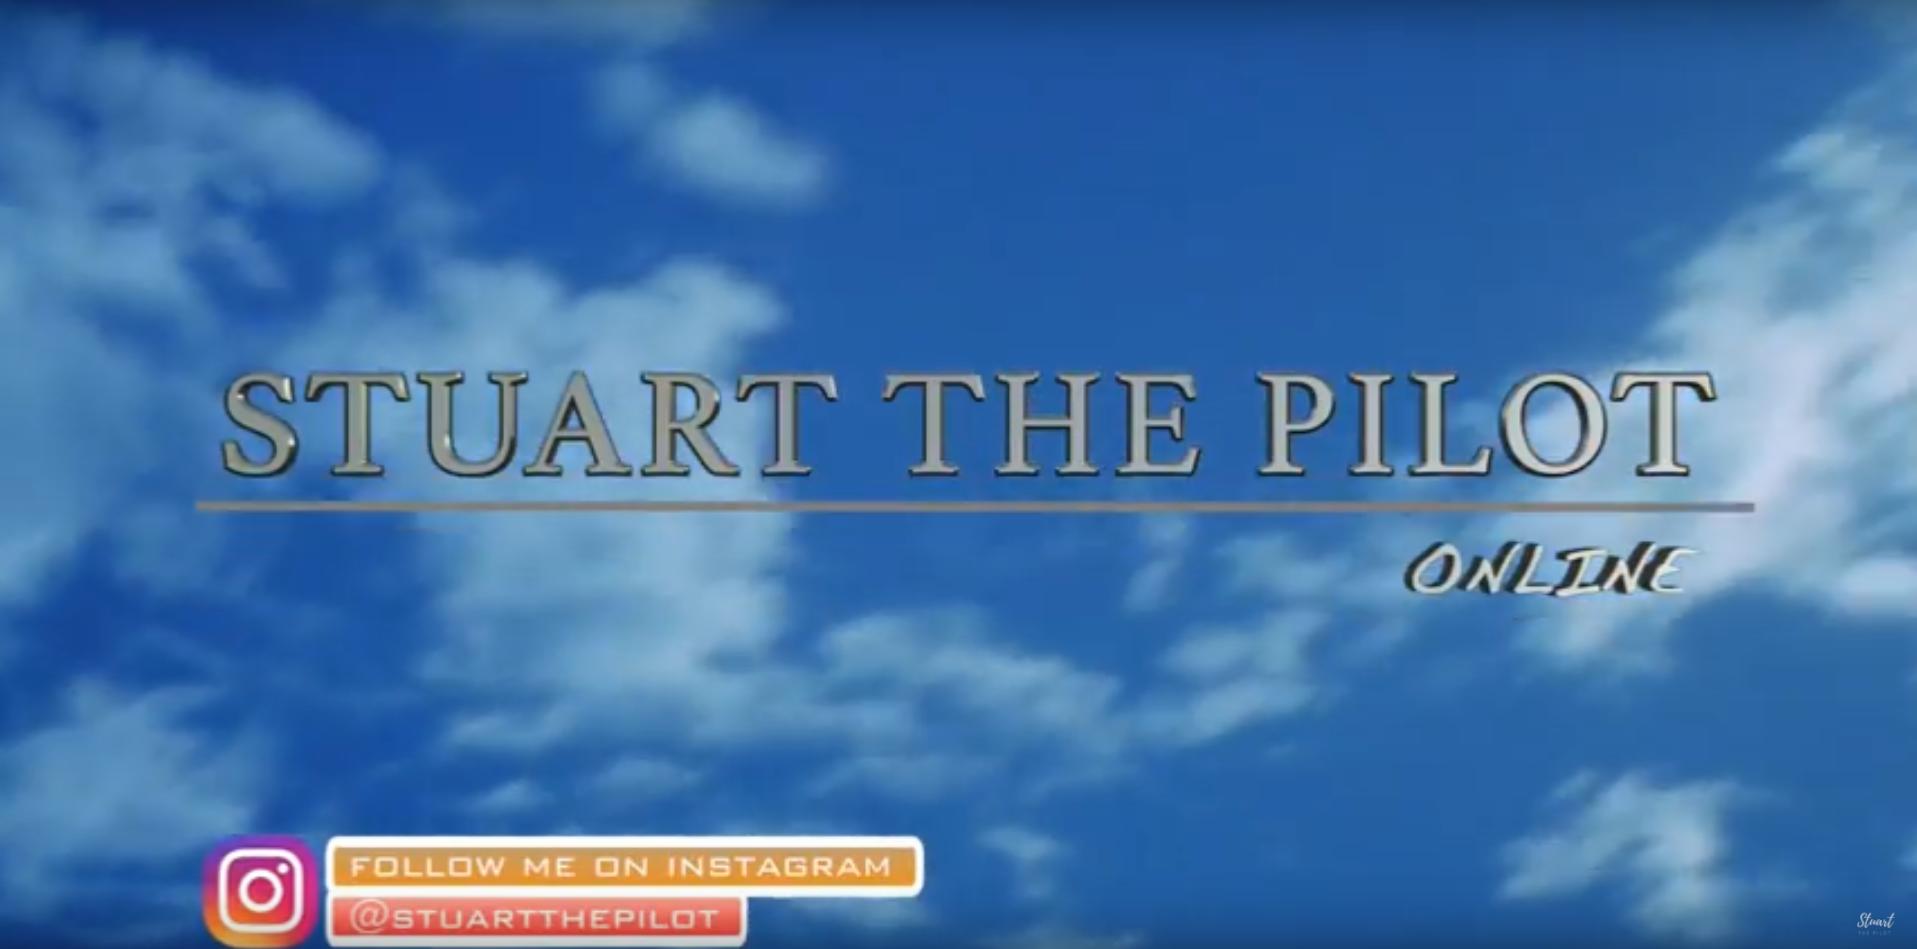 Stuart the Pilot YouTube channel